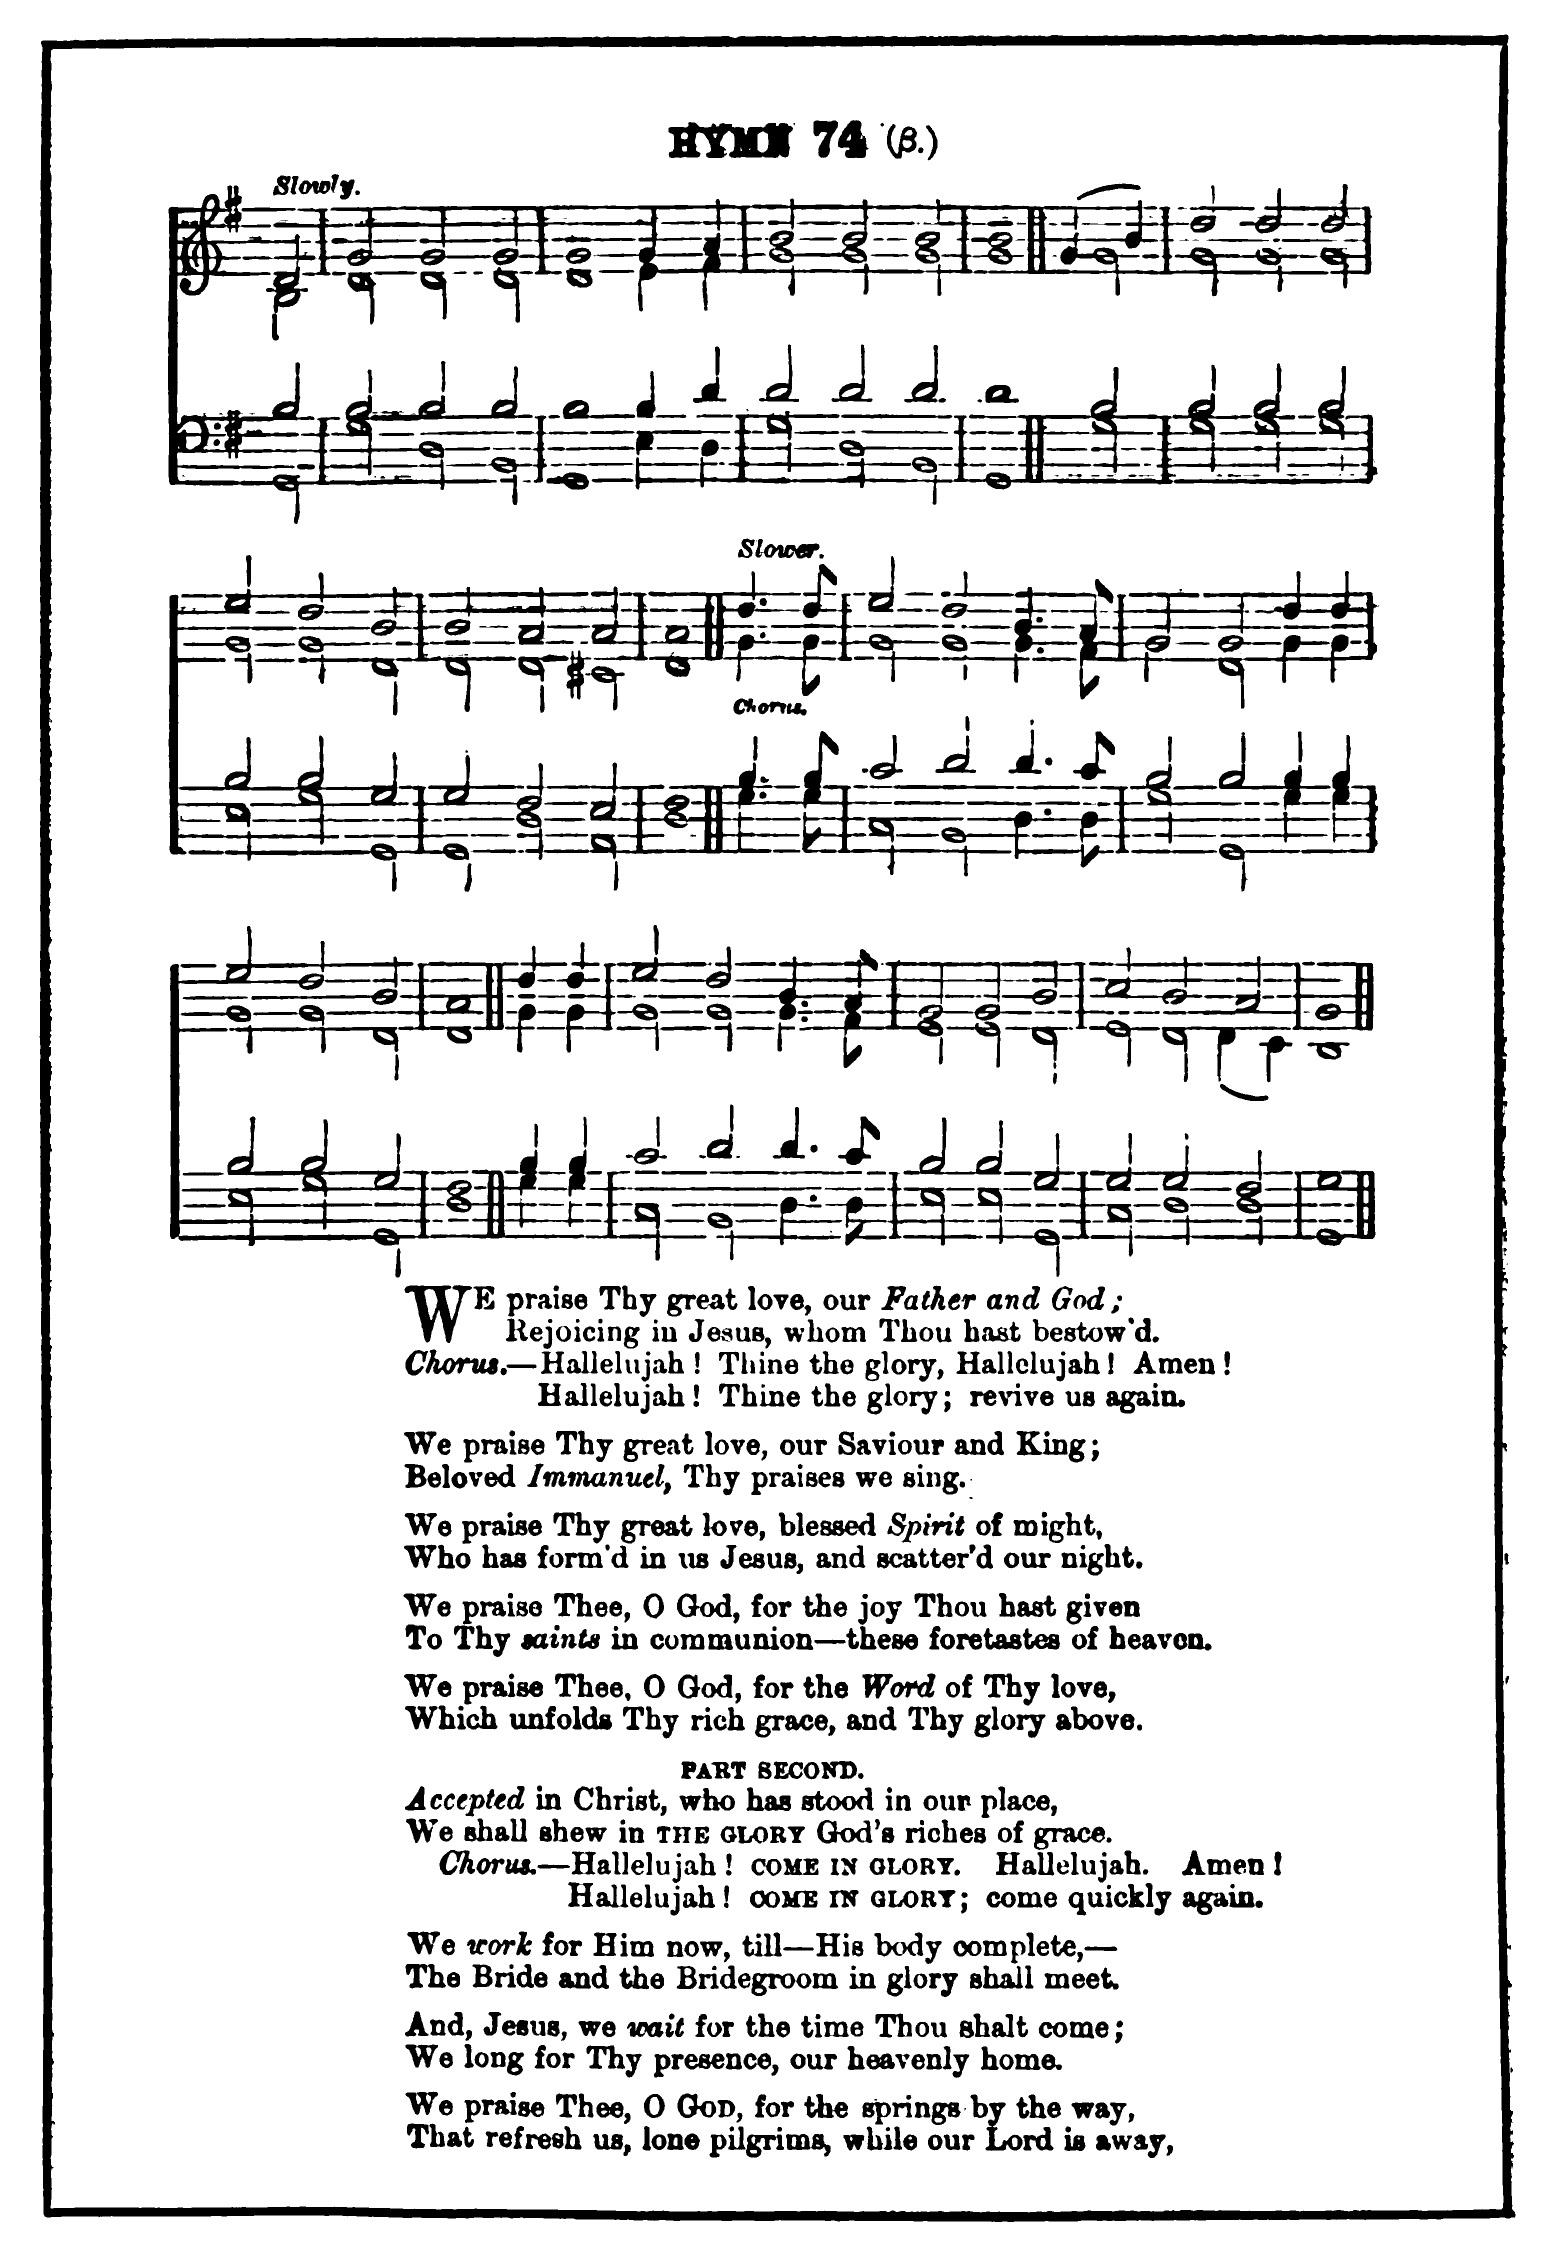 Fig. 2.  William Reid,  The Praise-Book  (London: James Nisbet, 1866).